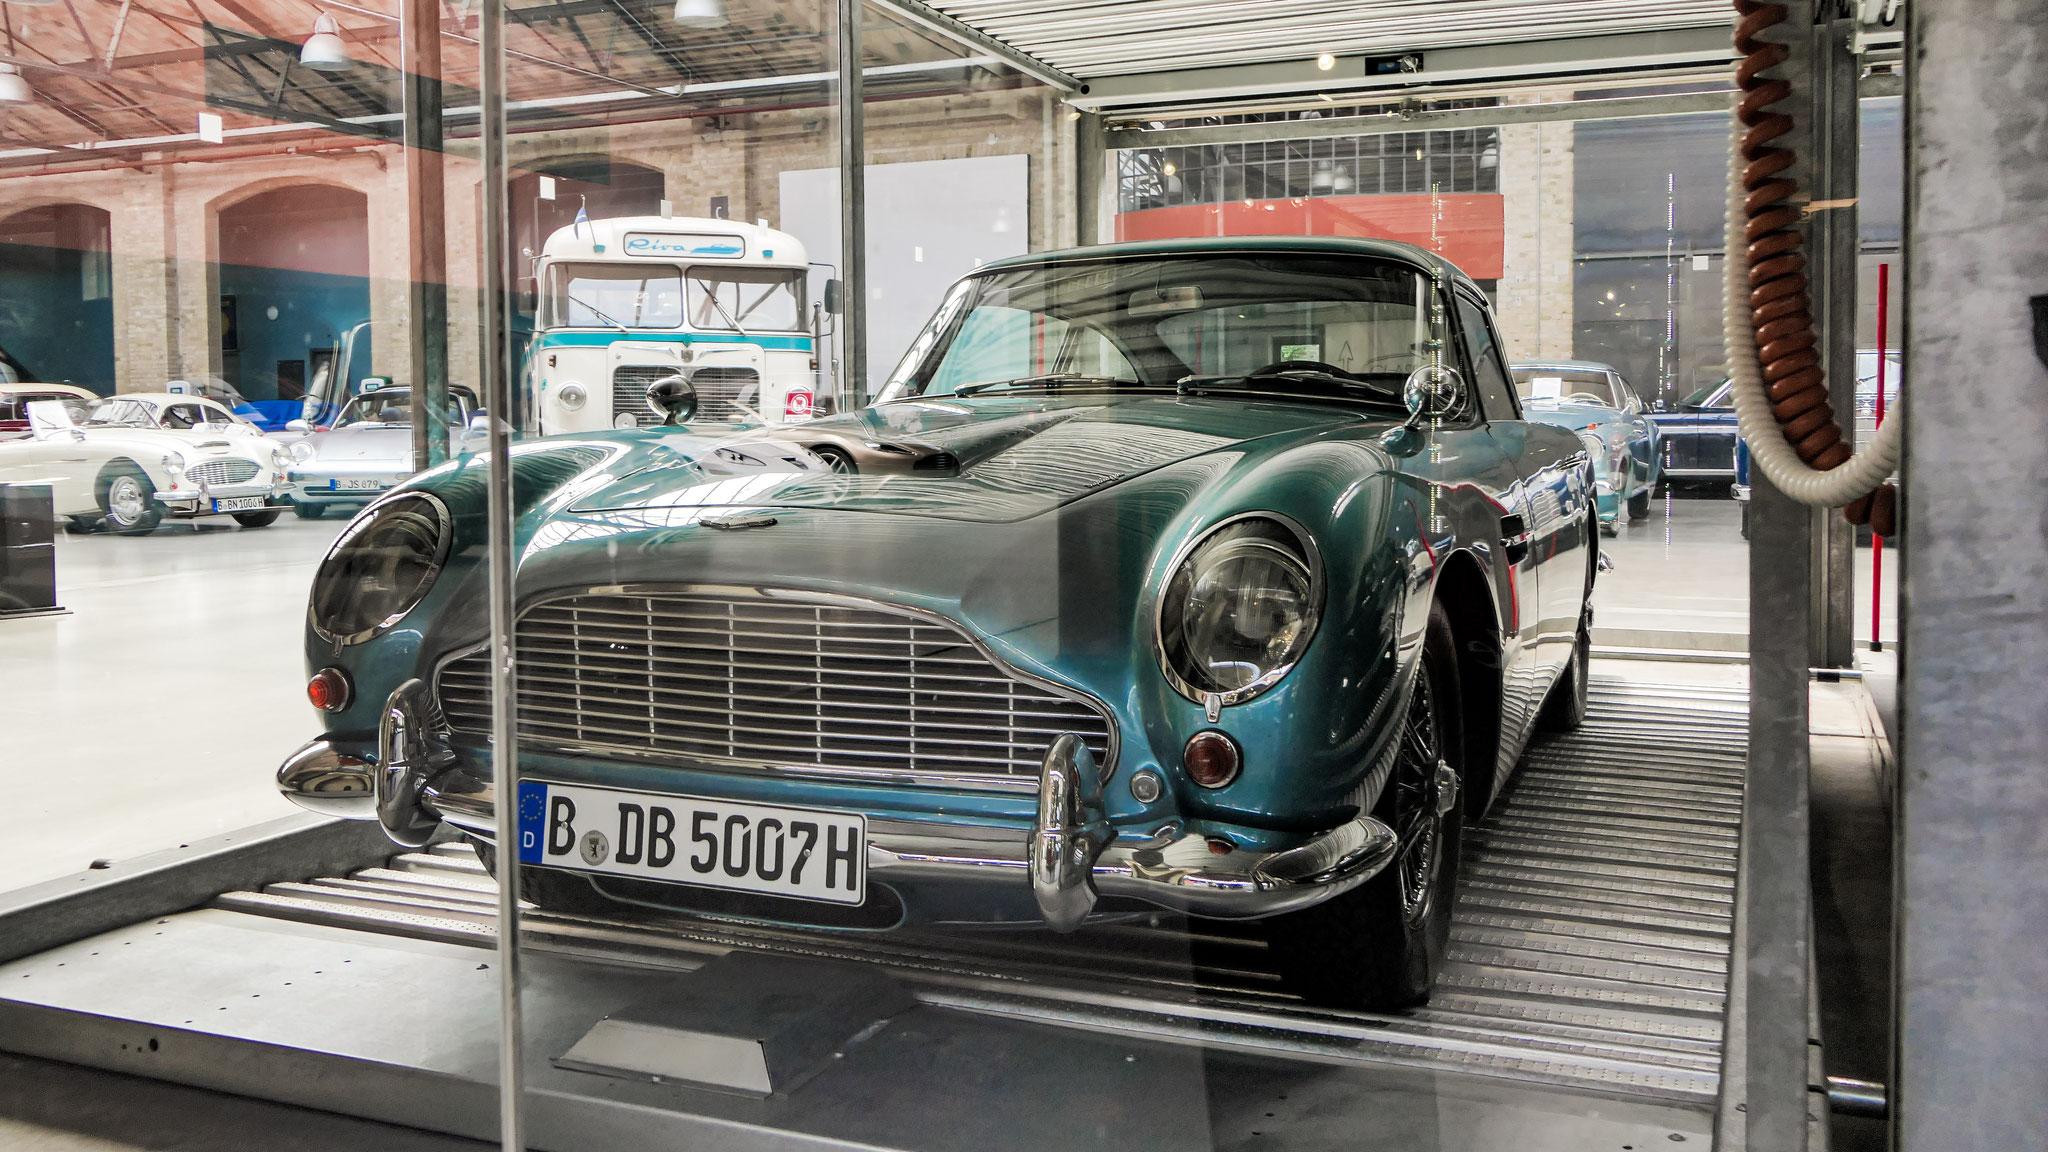 Aston Martin DB5 - B-DB-5007H